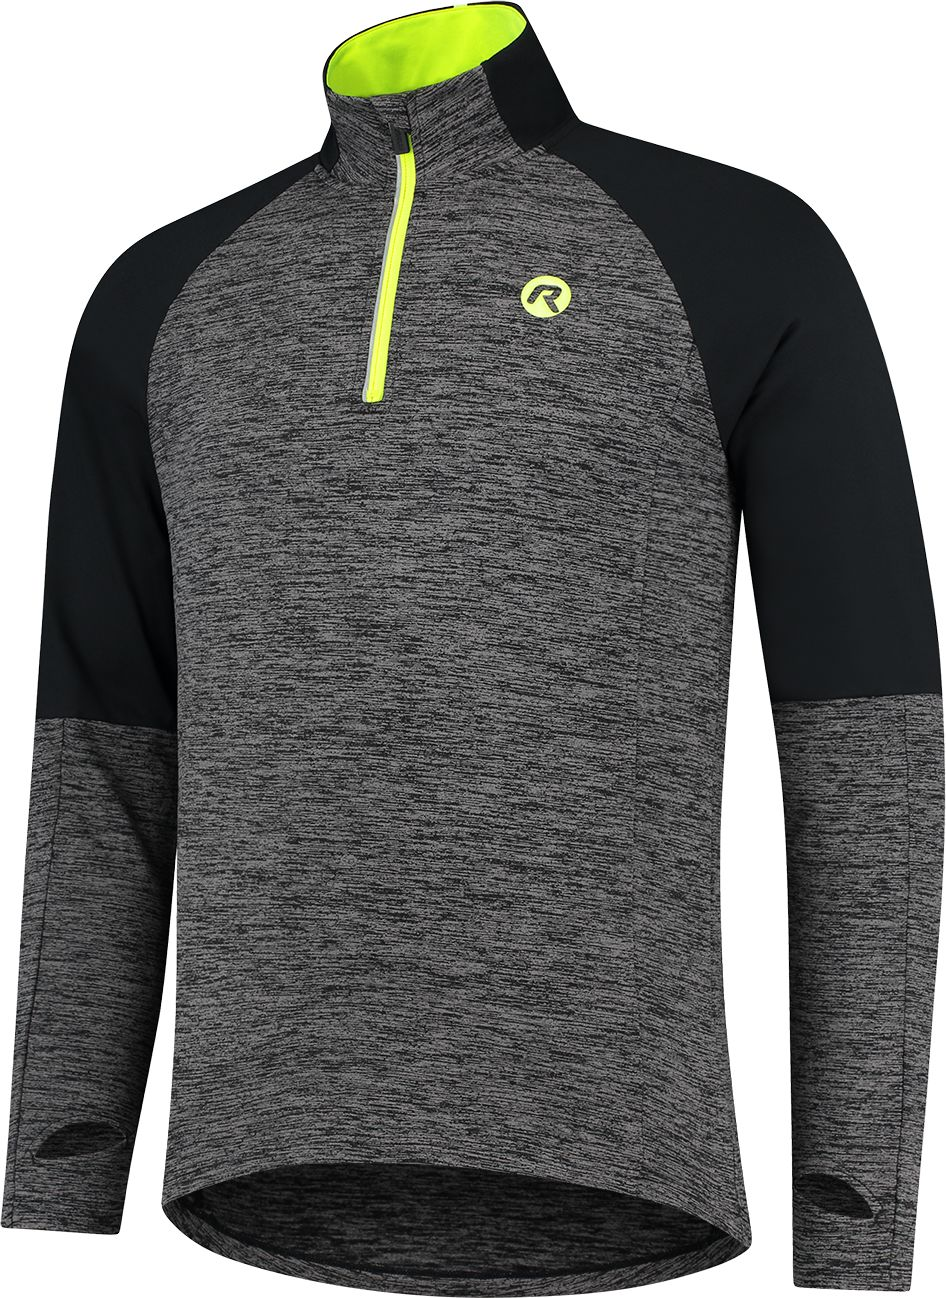 ROGELLI męska bluza do biegania ENJOY black/grey ROG351102 Rozmiar: 2XL,ROG351102.S